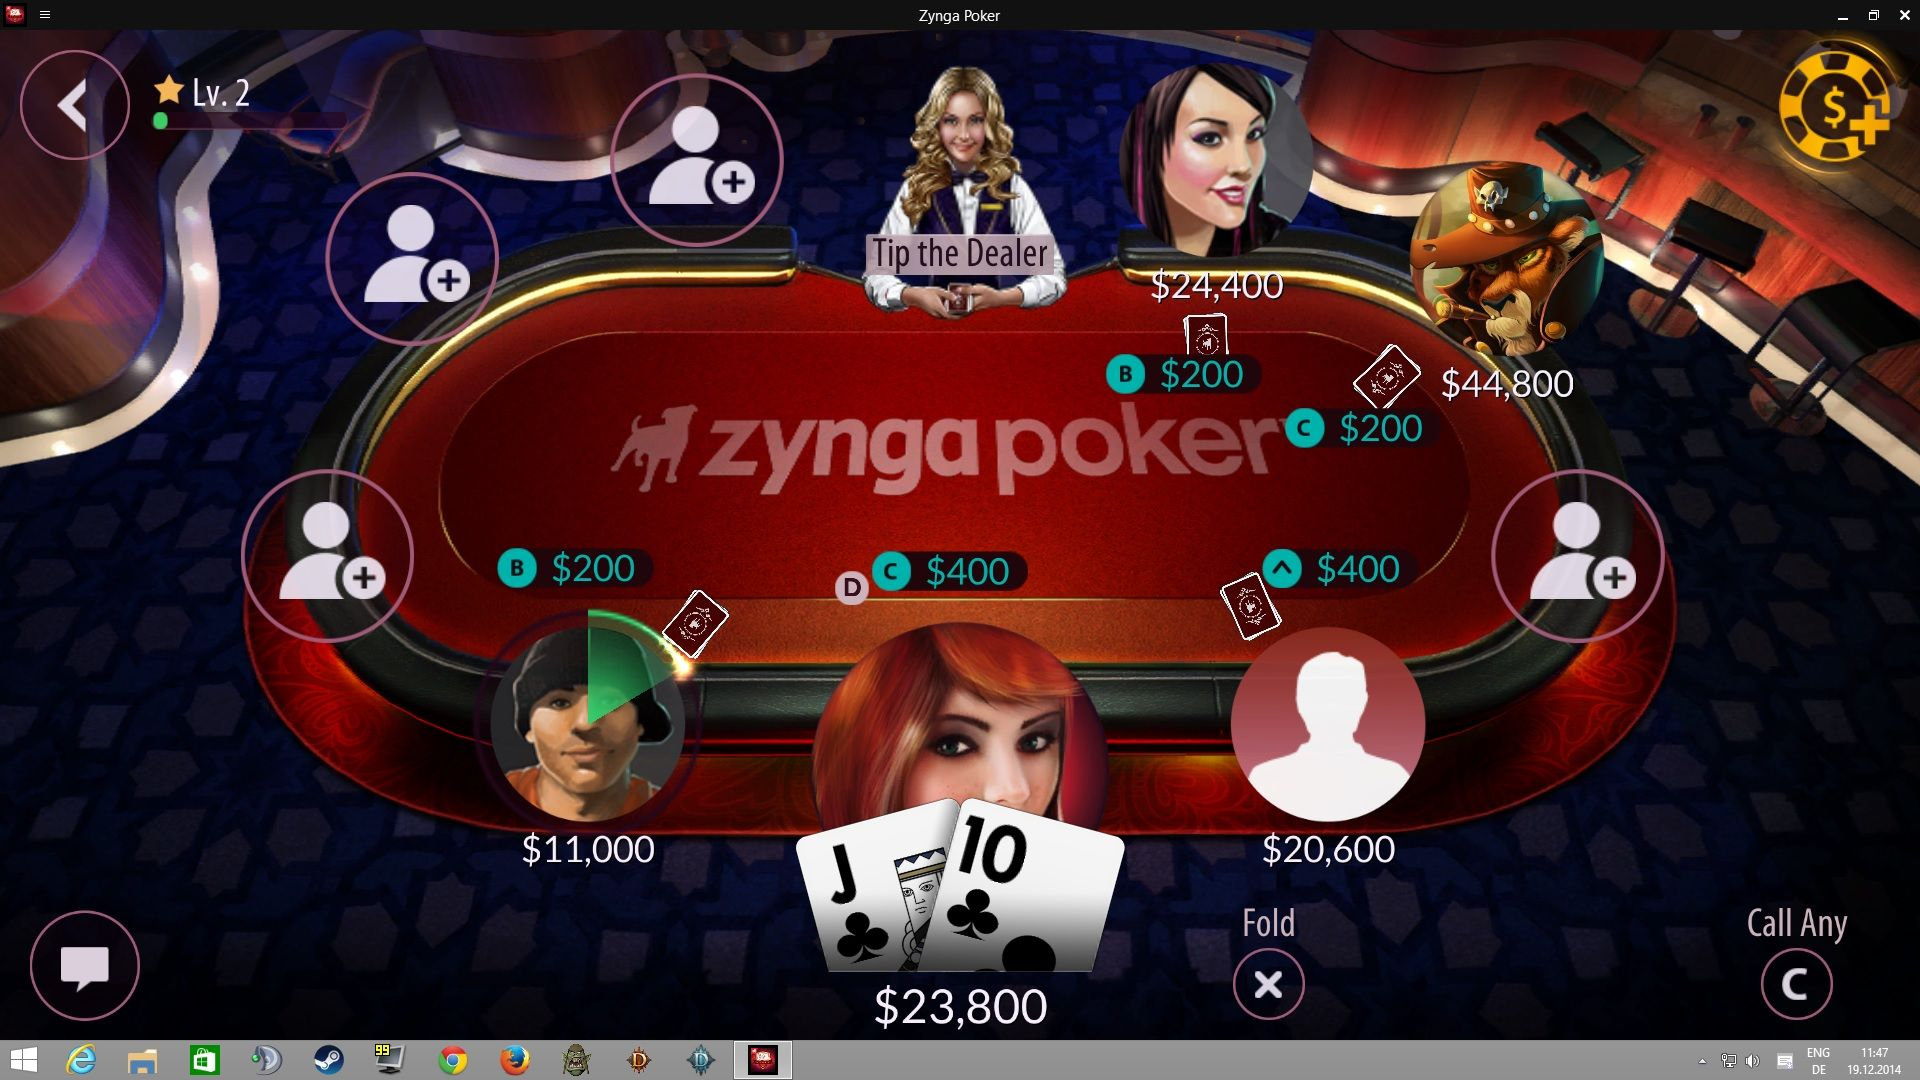 Lets Go To Zynga Poker Texas Holdem Generator Site New Zynga Poker Texas Holdem Hack Online Real Works Www Ha Free Poker Games Poker Games Games For Fun